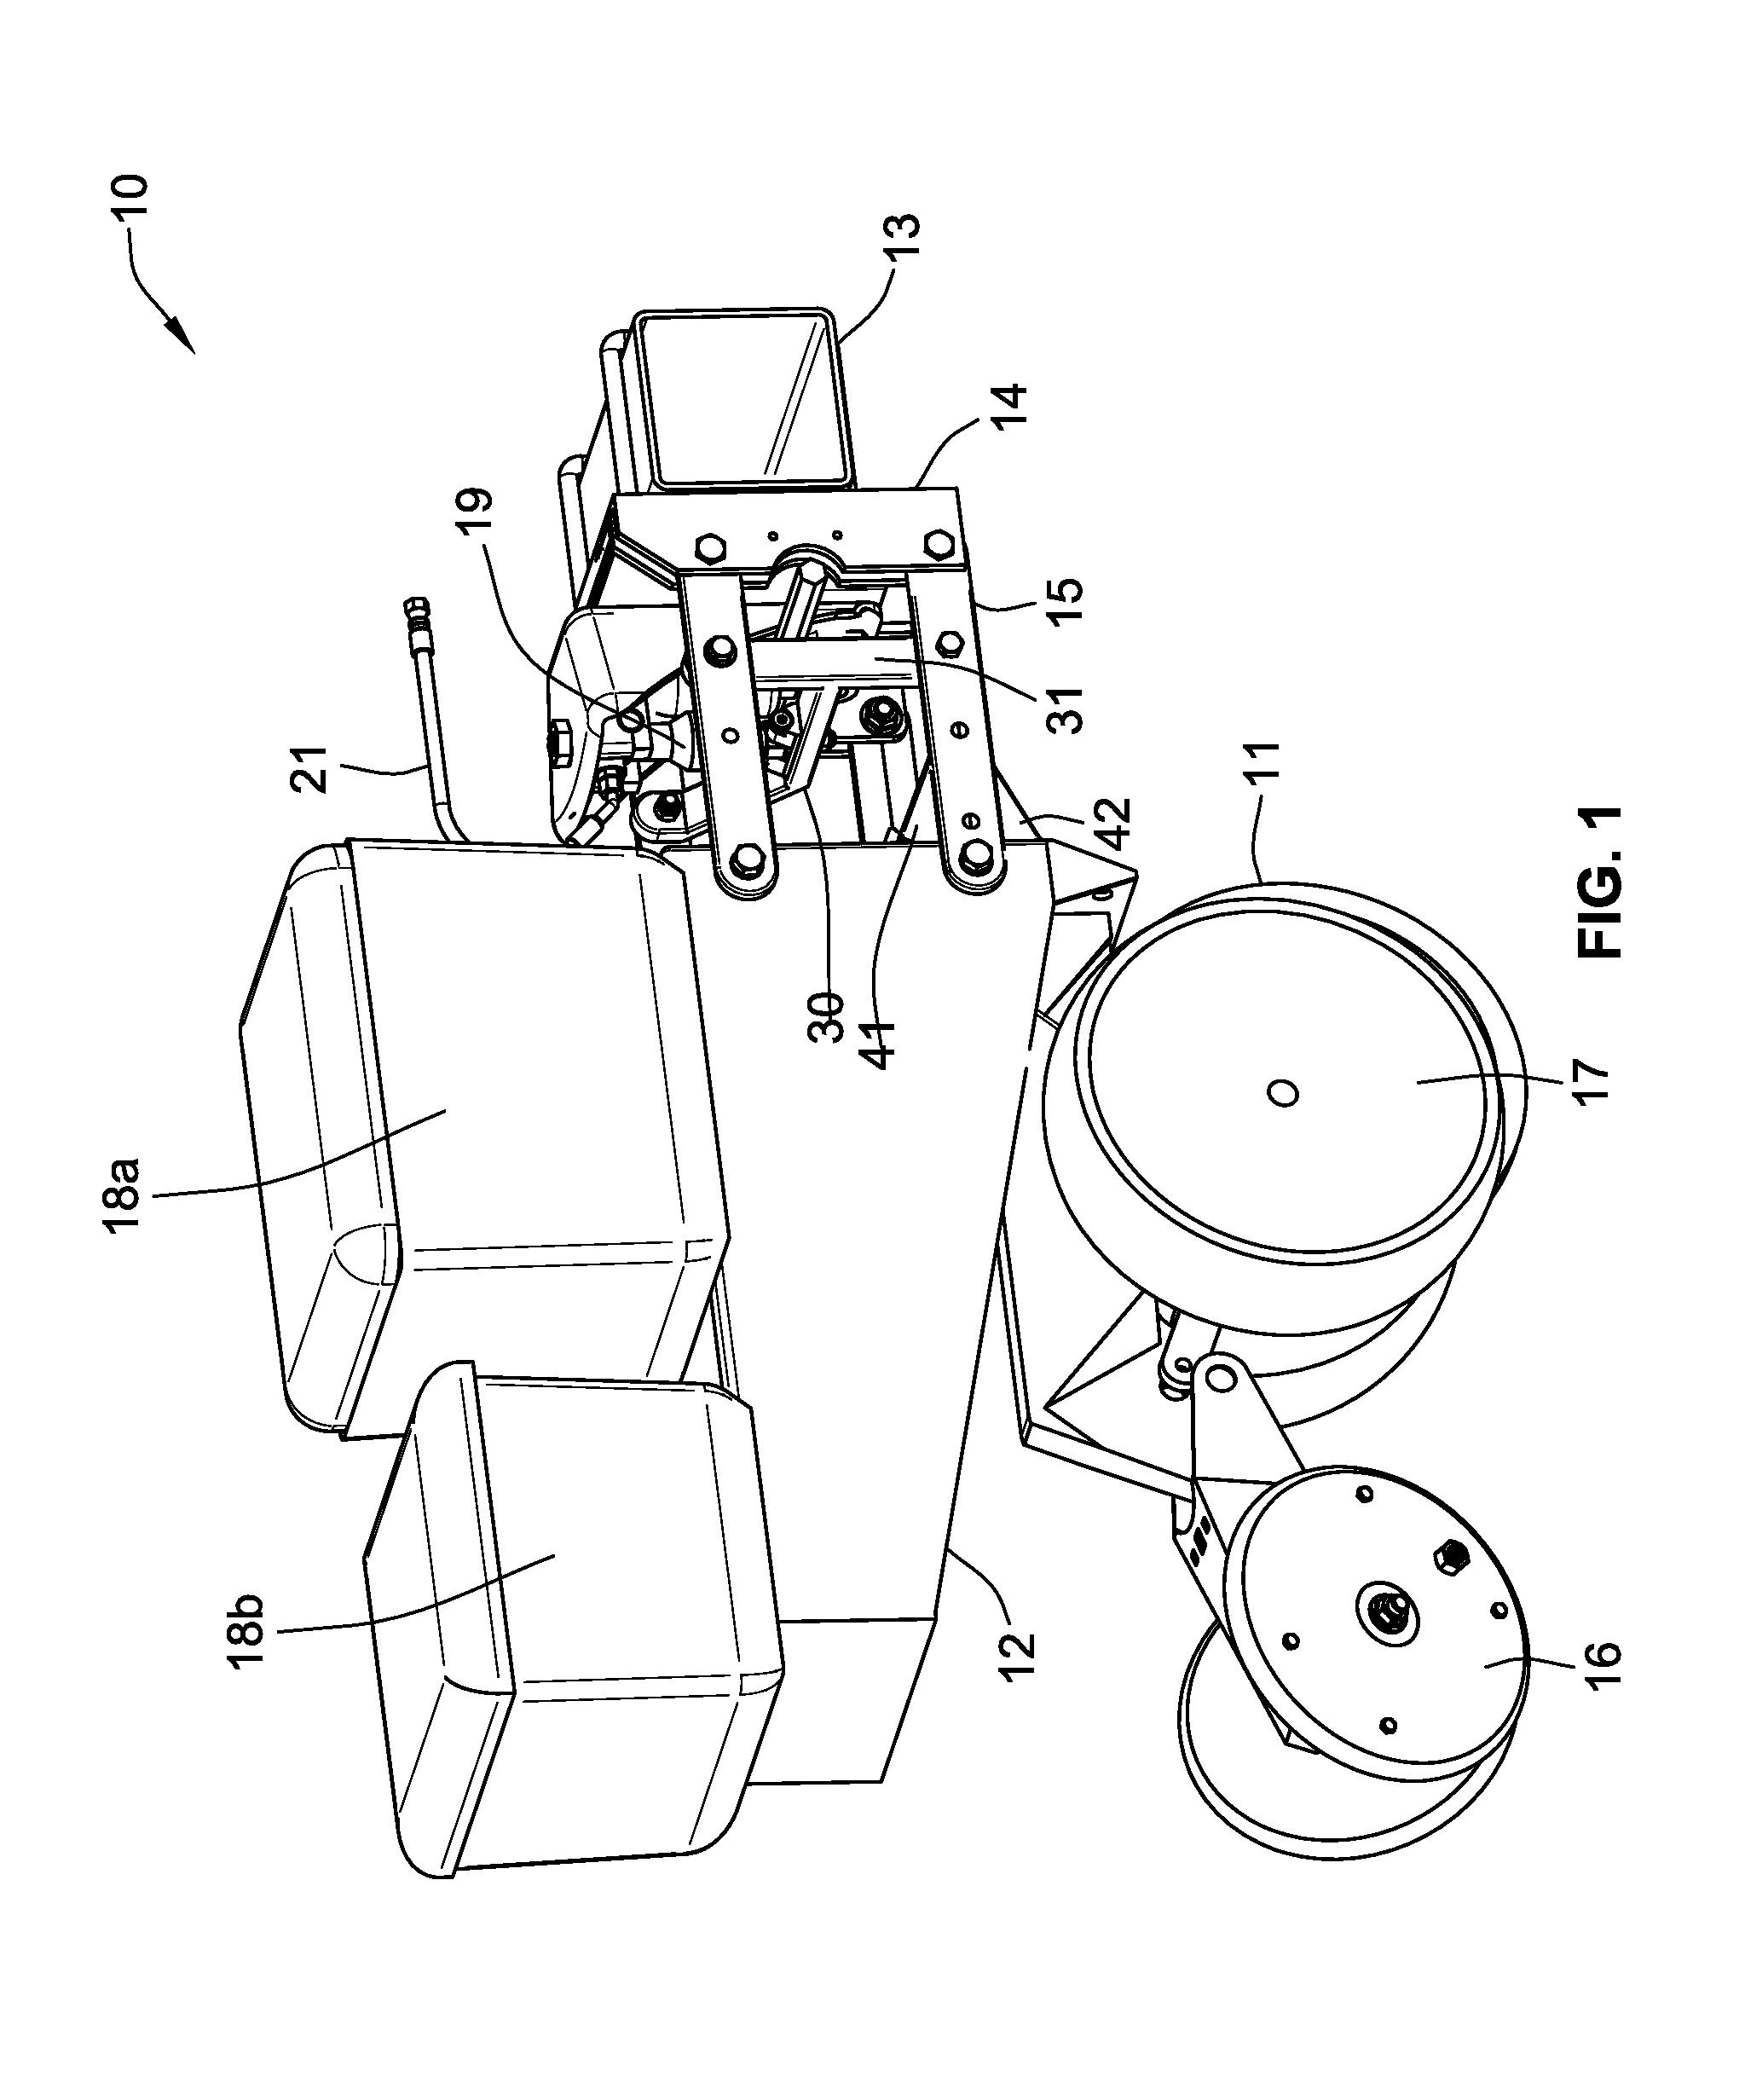 international 4700 dt466e diagram